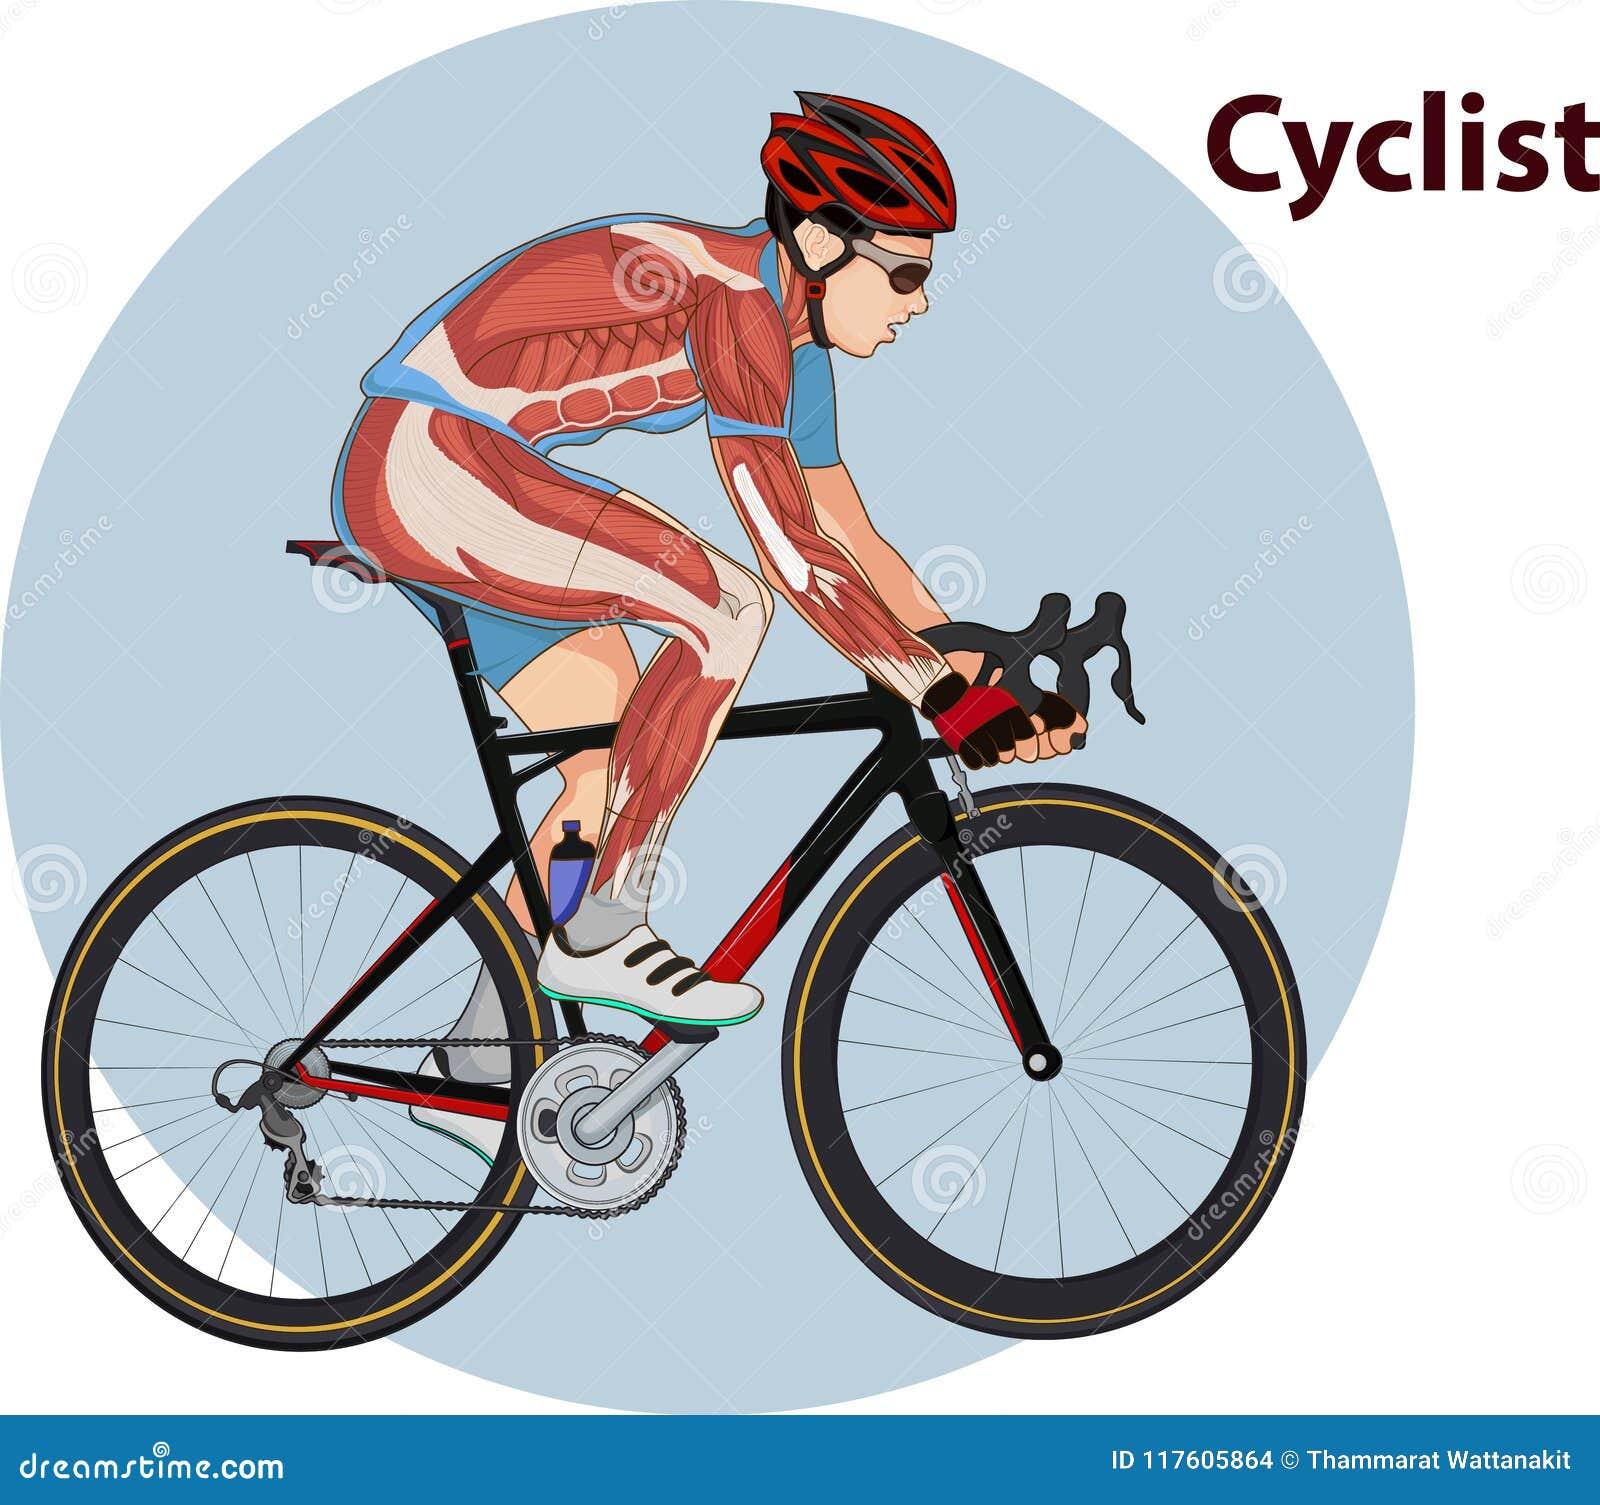 Vector Illustration Of Cyclist Muscle Anatomy Stock Illustration ...